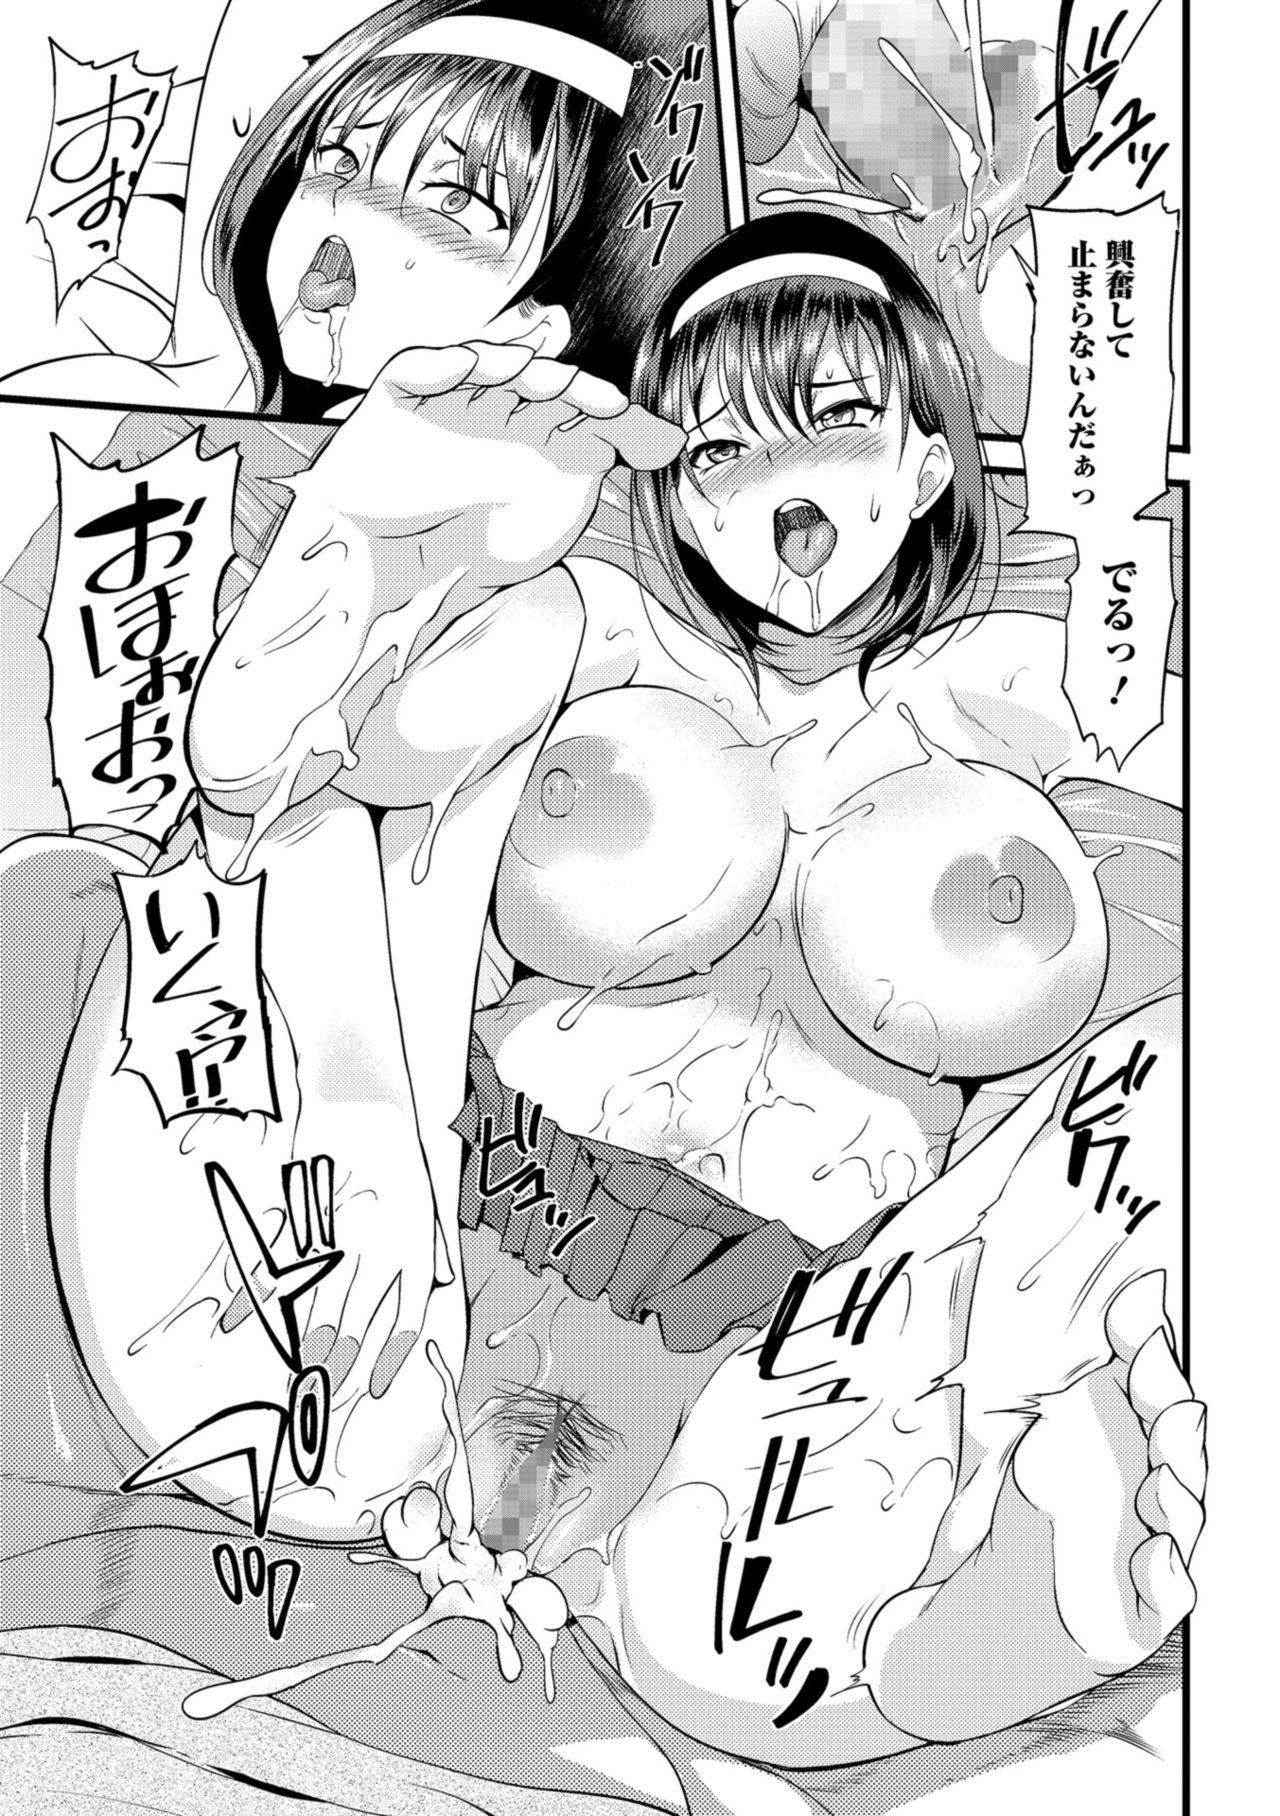 COMIC Shigekiteki SQUIRT!! Vol. 09 212